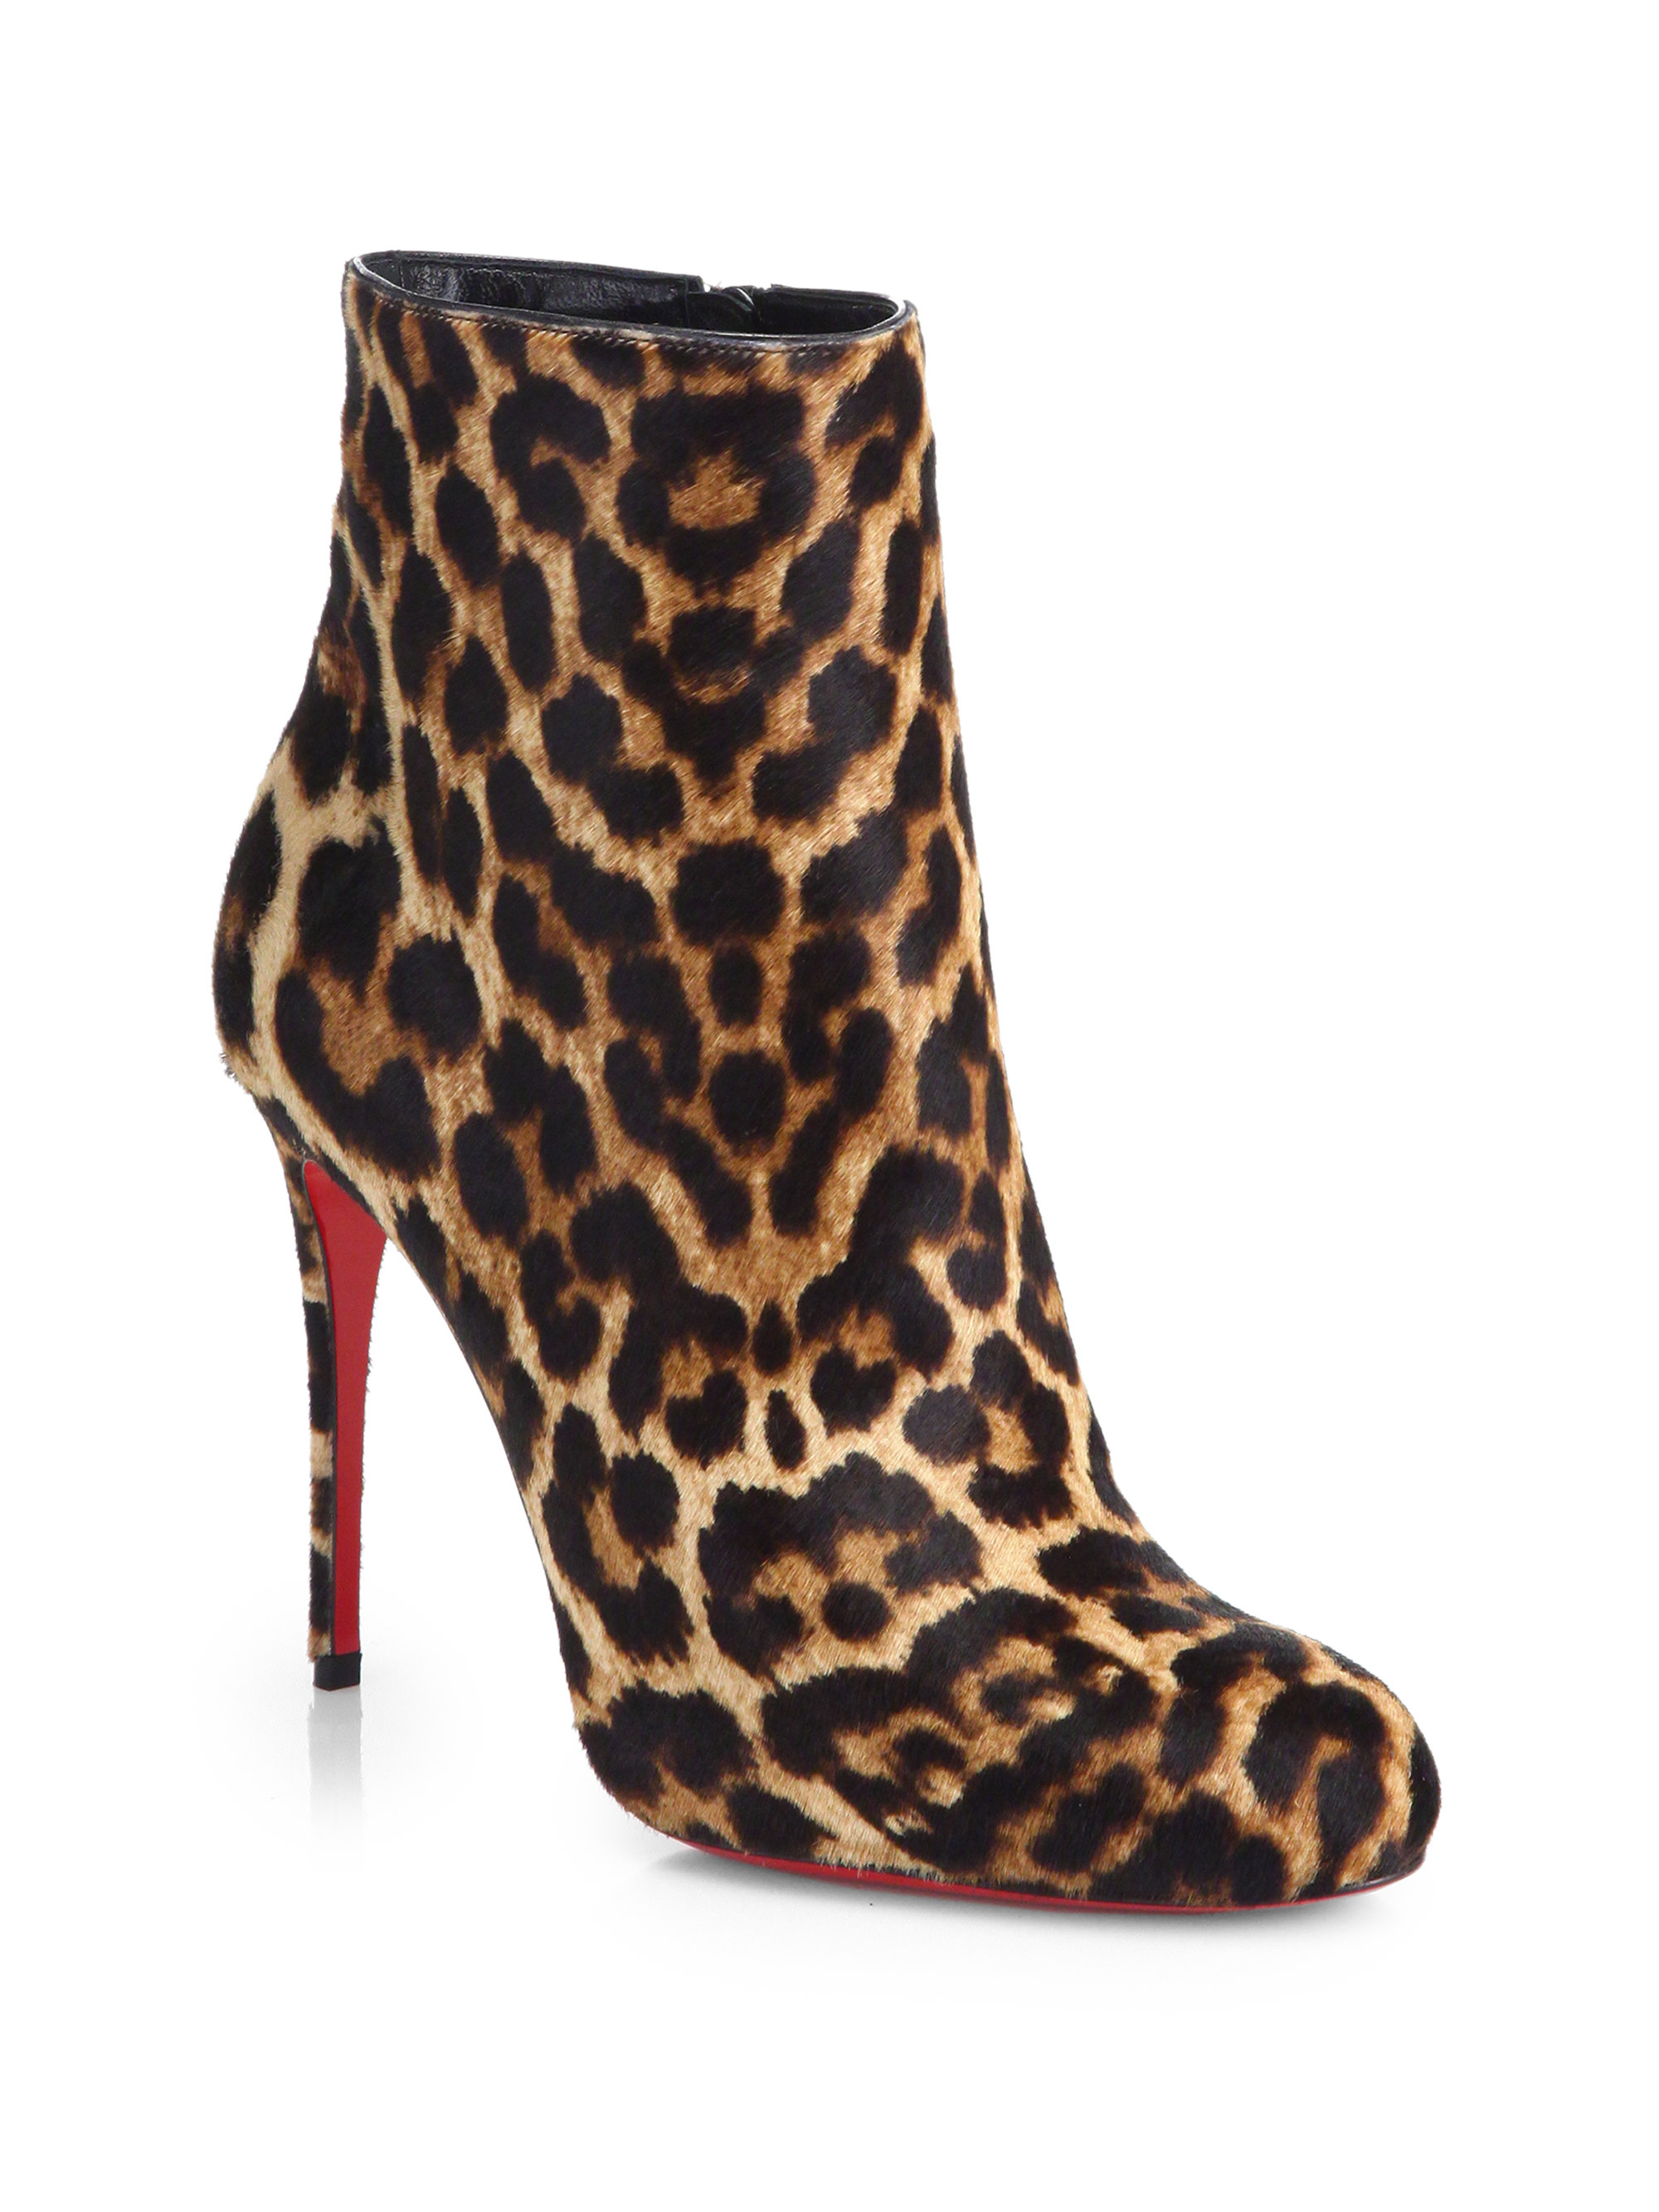 Lyst Christian Louboutin Fifi Leopard Print Calf Hair Boots